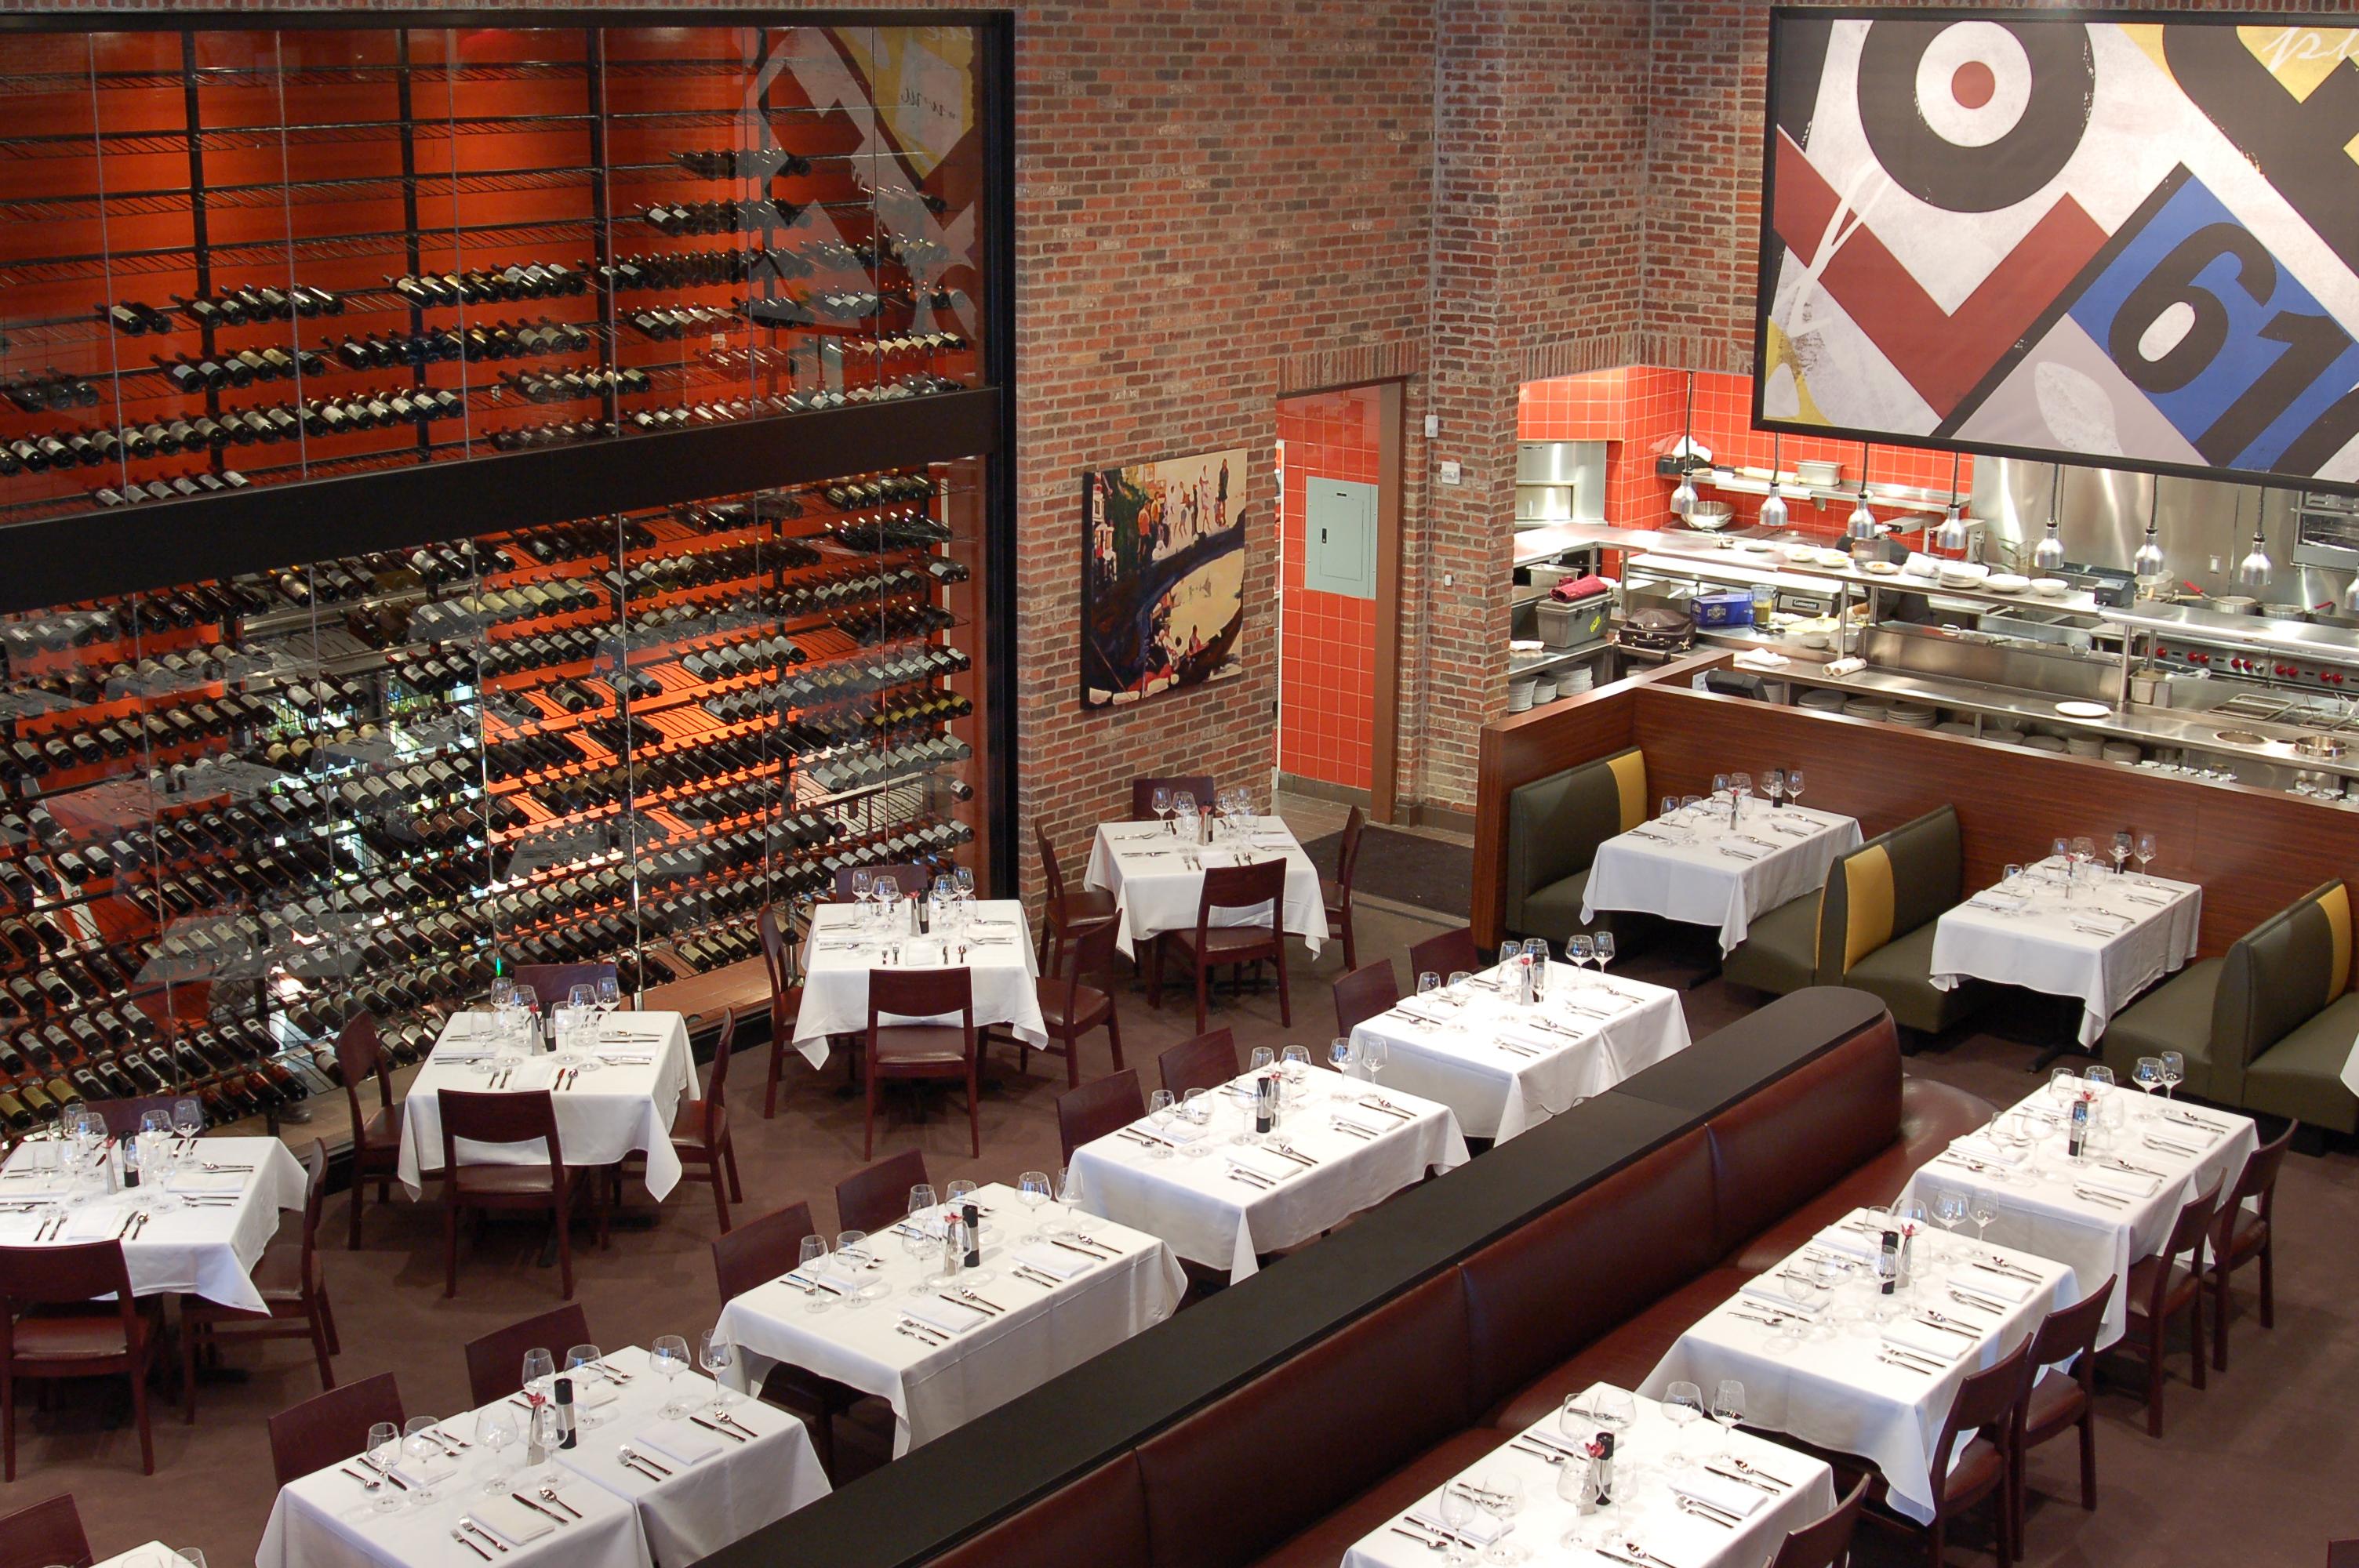 Loft 610 Urban Restaurant  Lounge Announces Opening in